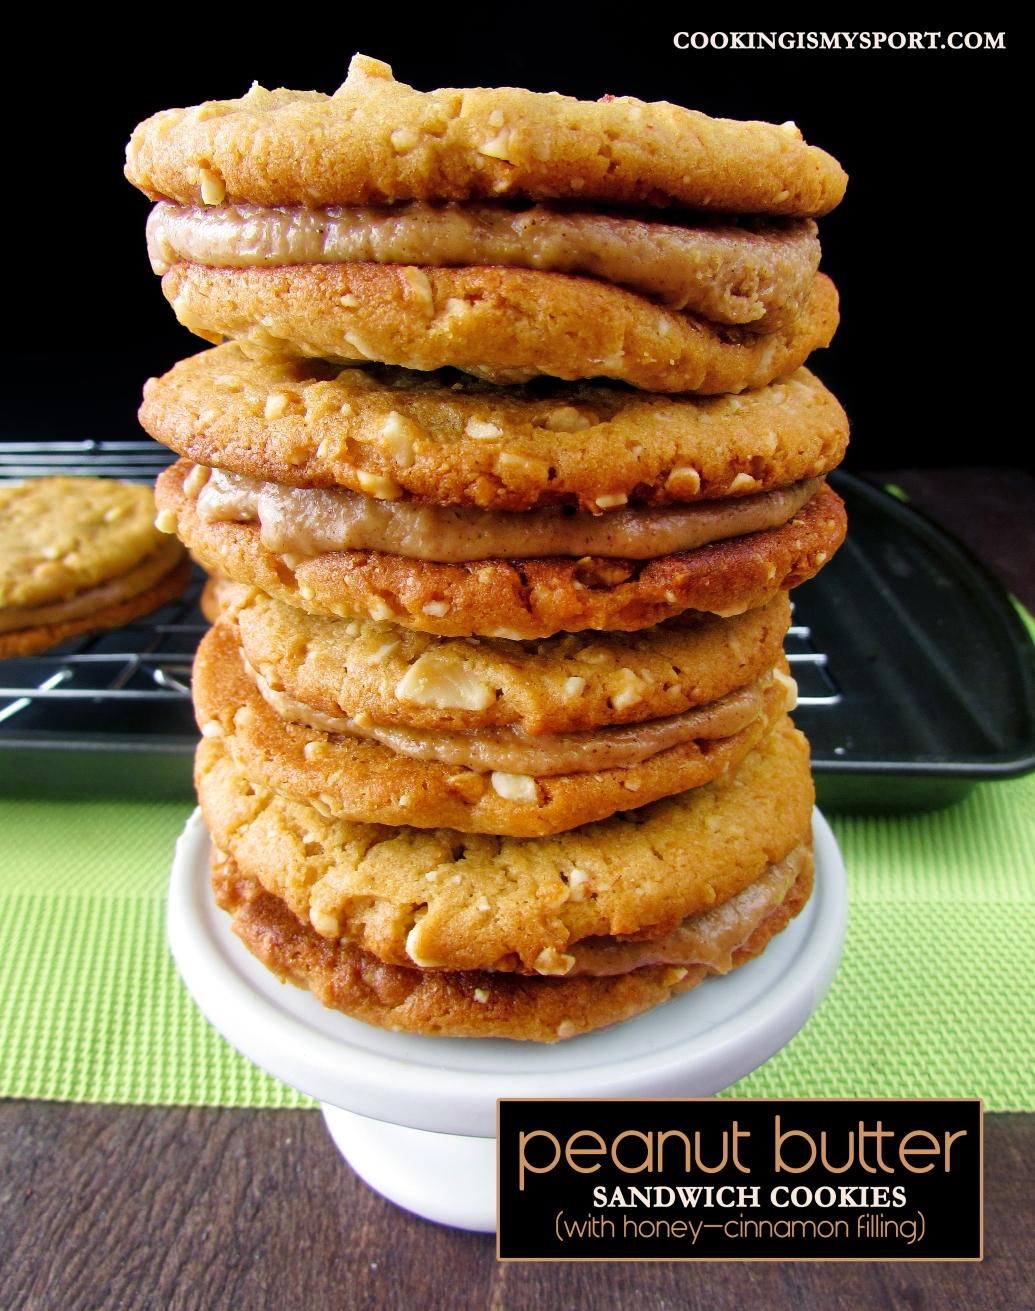 PB Sandwich Cookies4